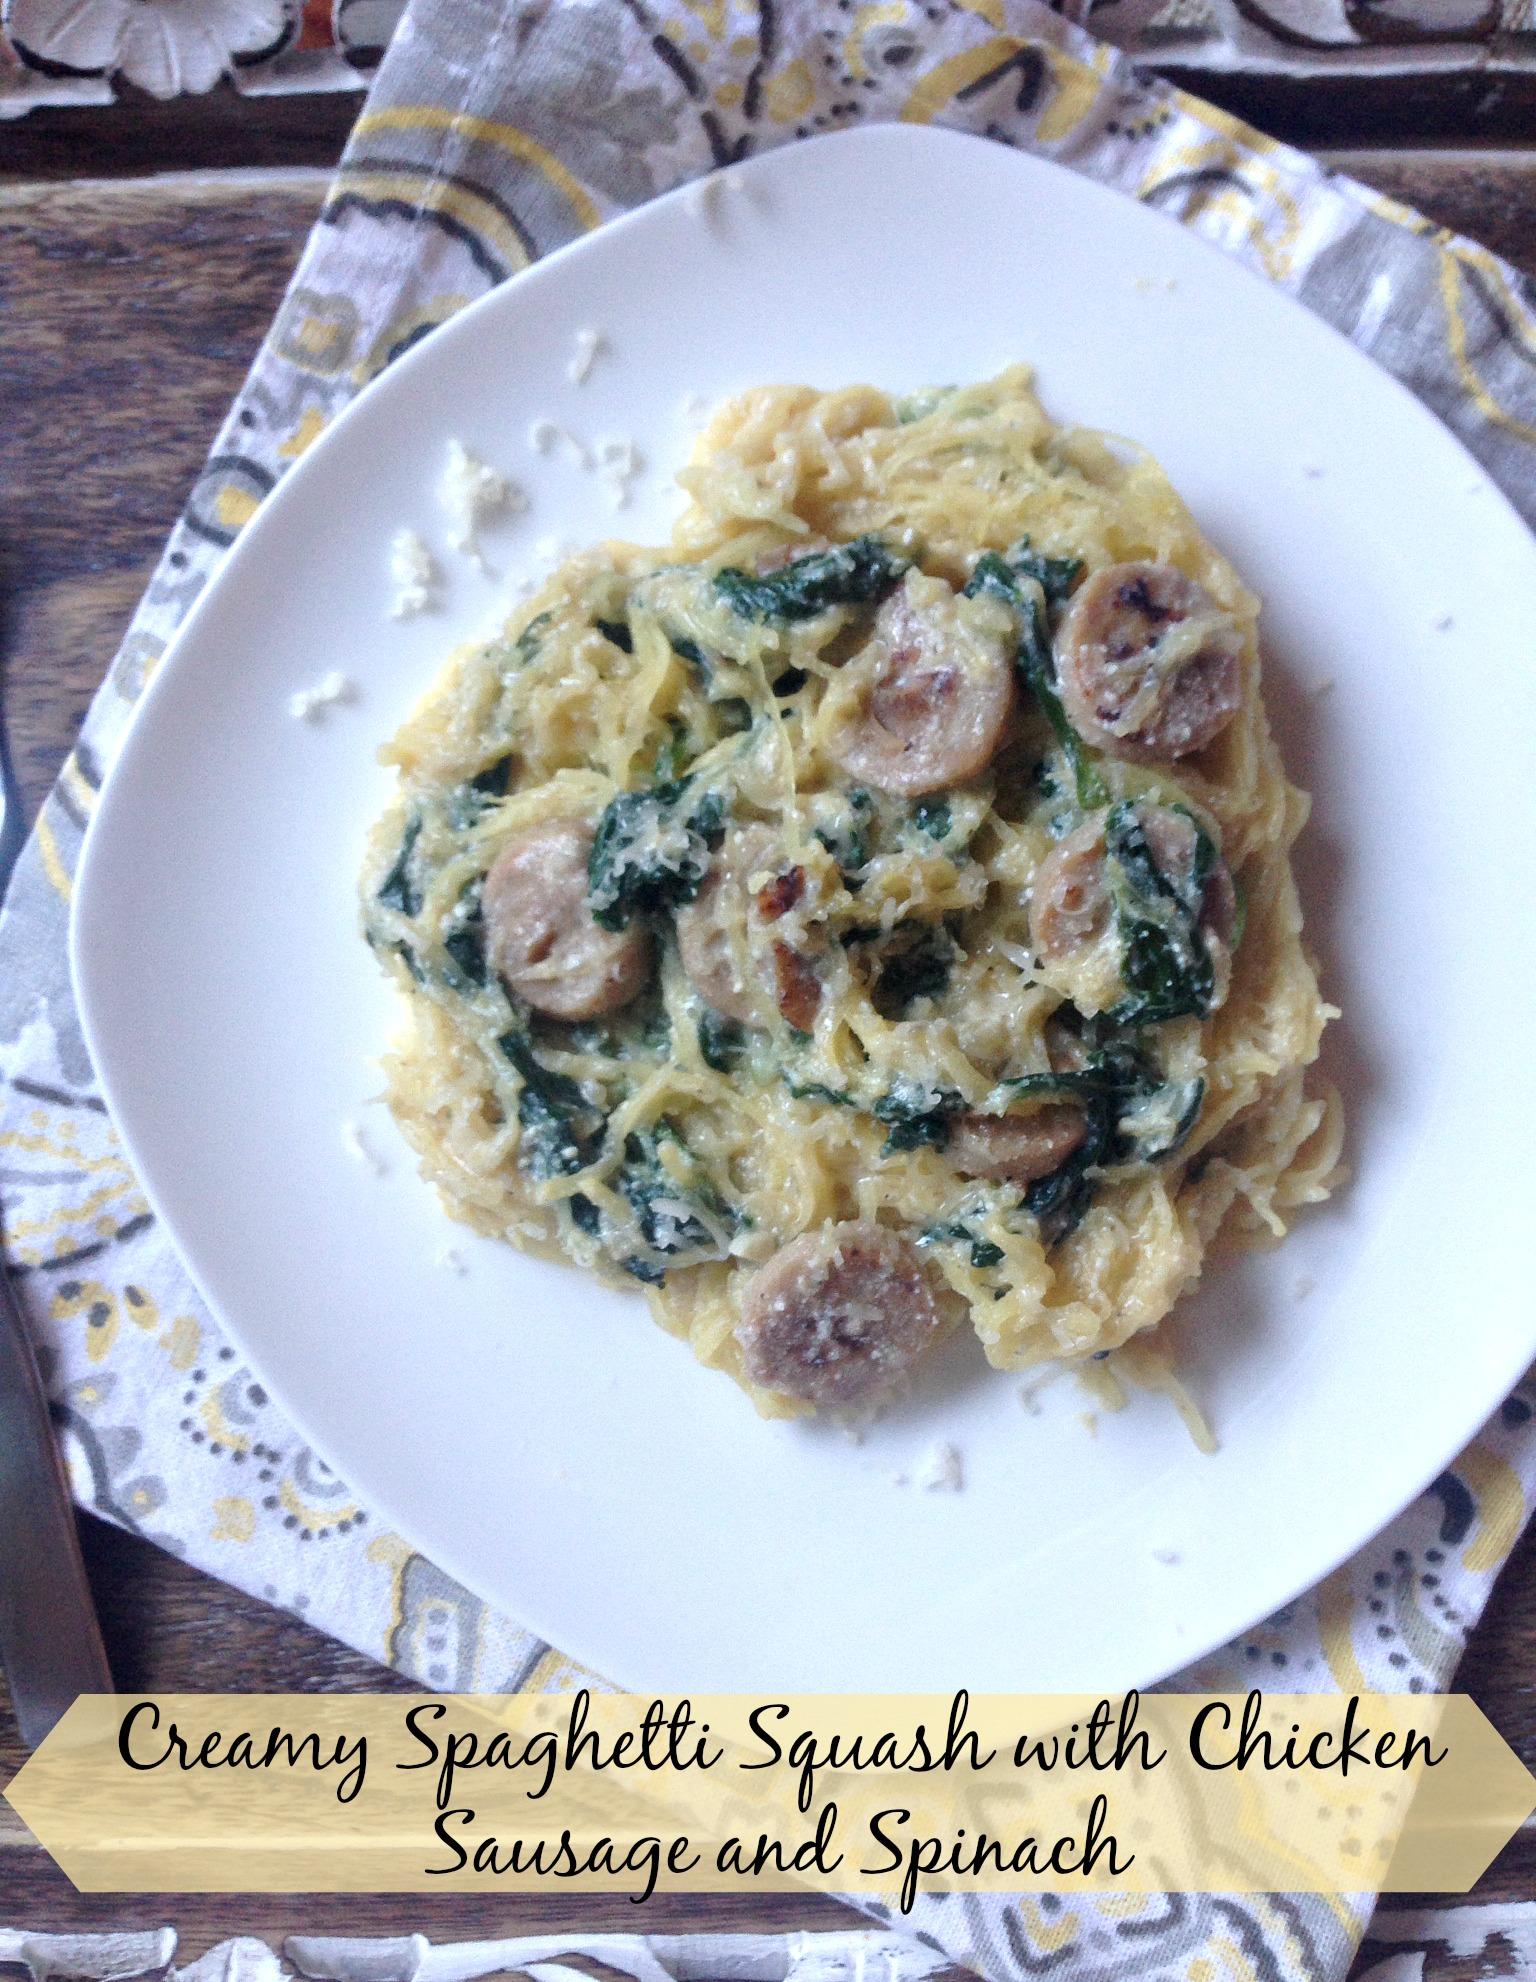 Creamy Spaghetti Squash with Chicken Sausage and Spinach